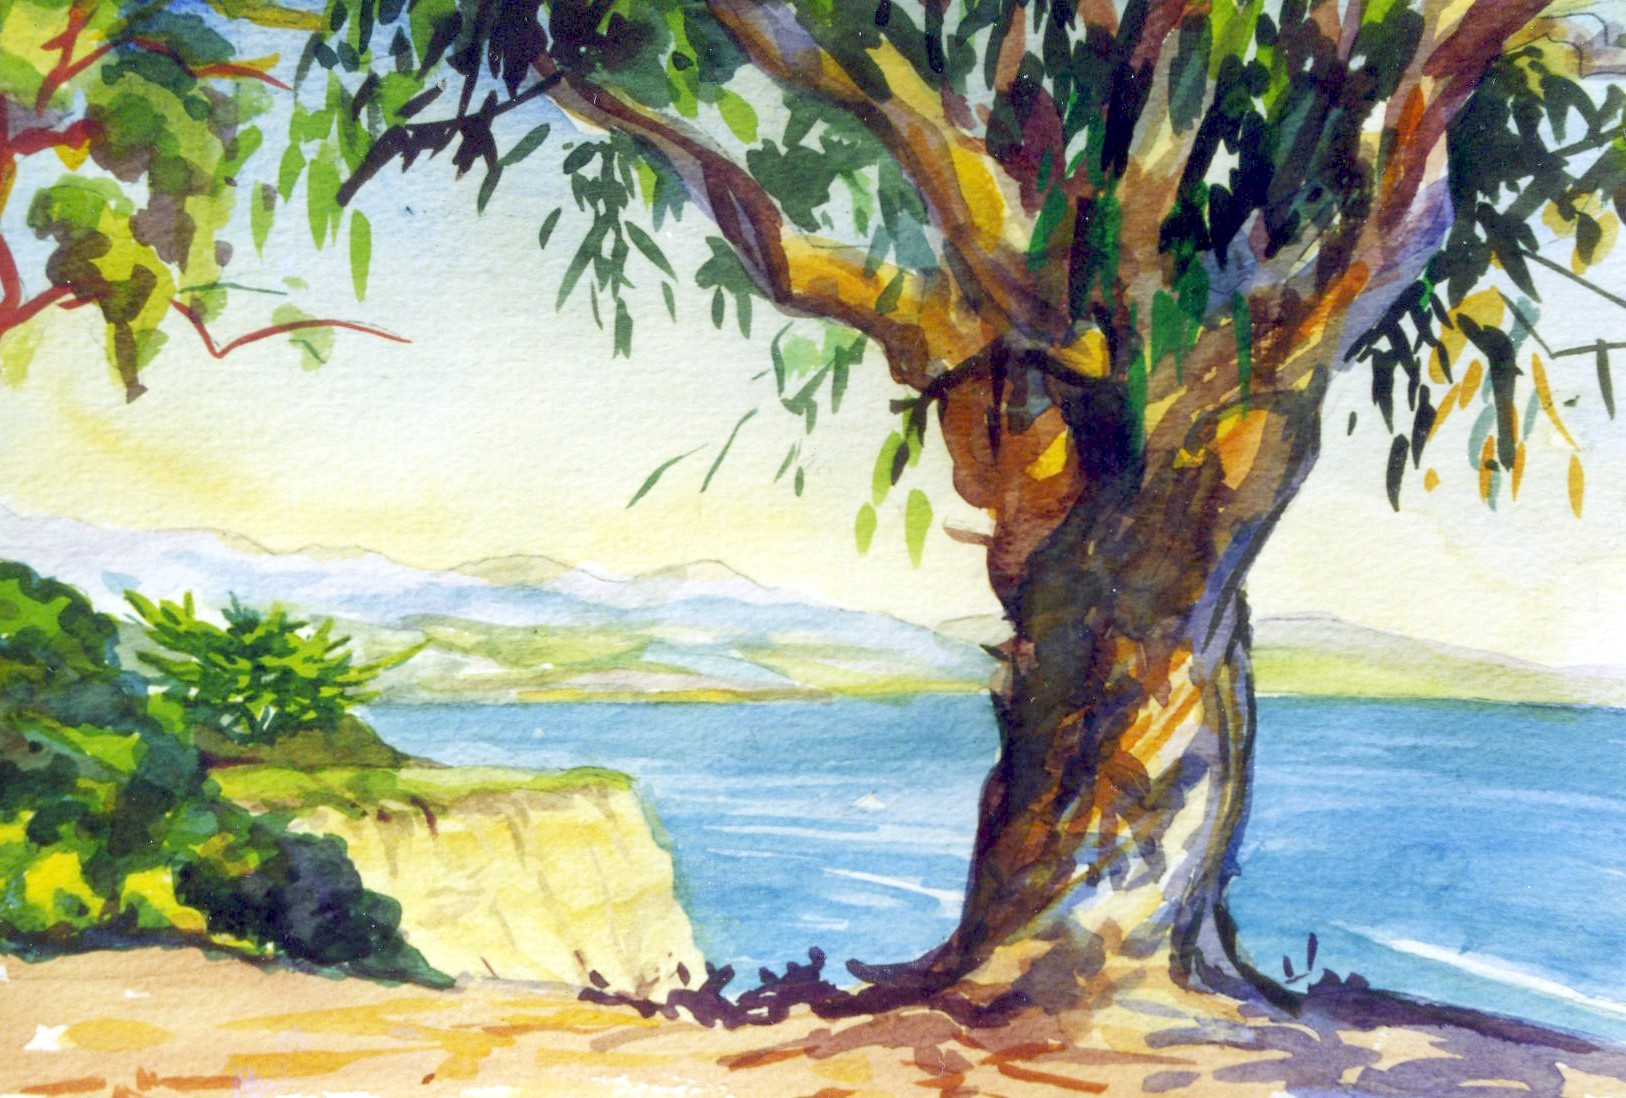 tree_on_cliff.jpg